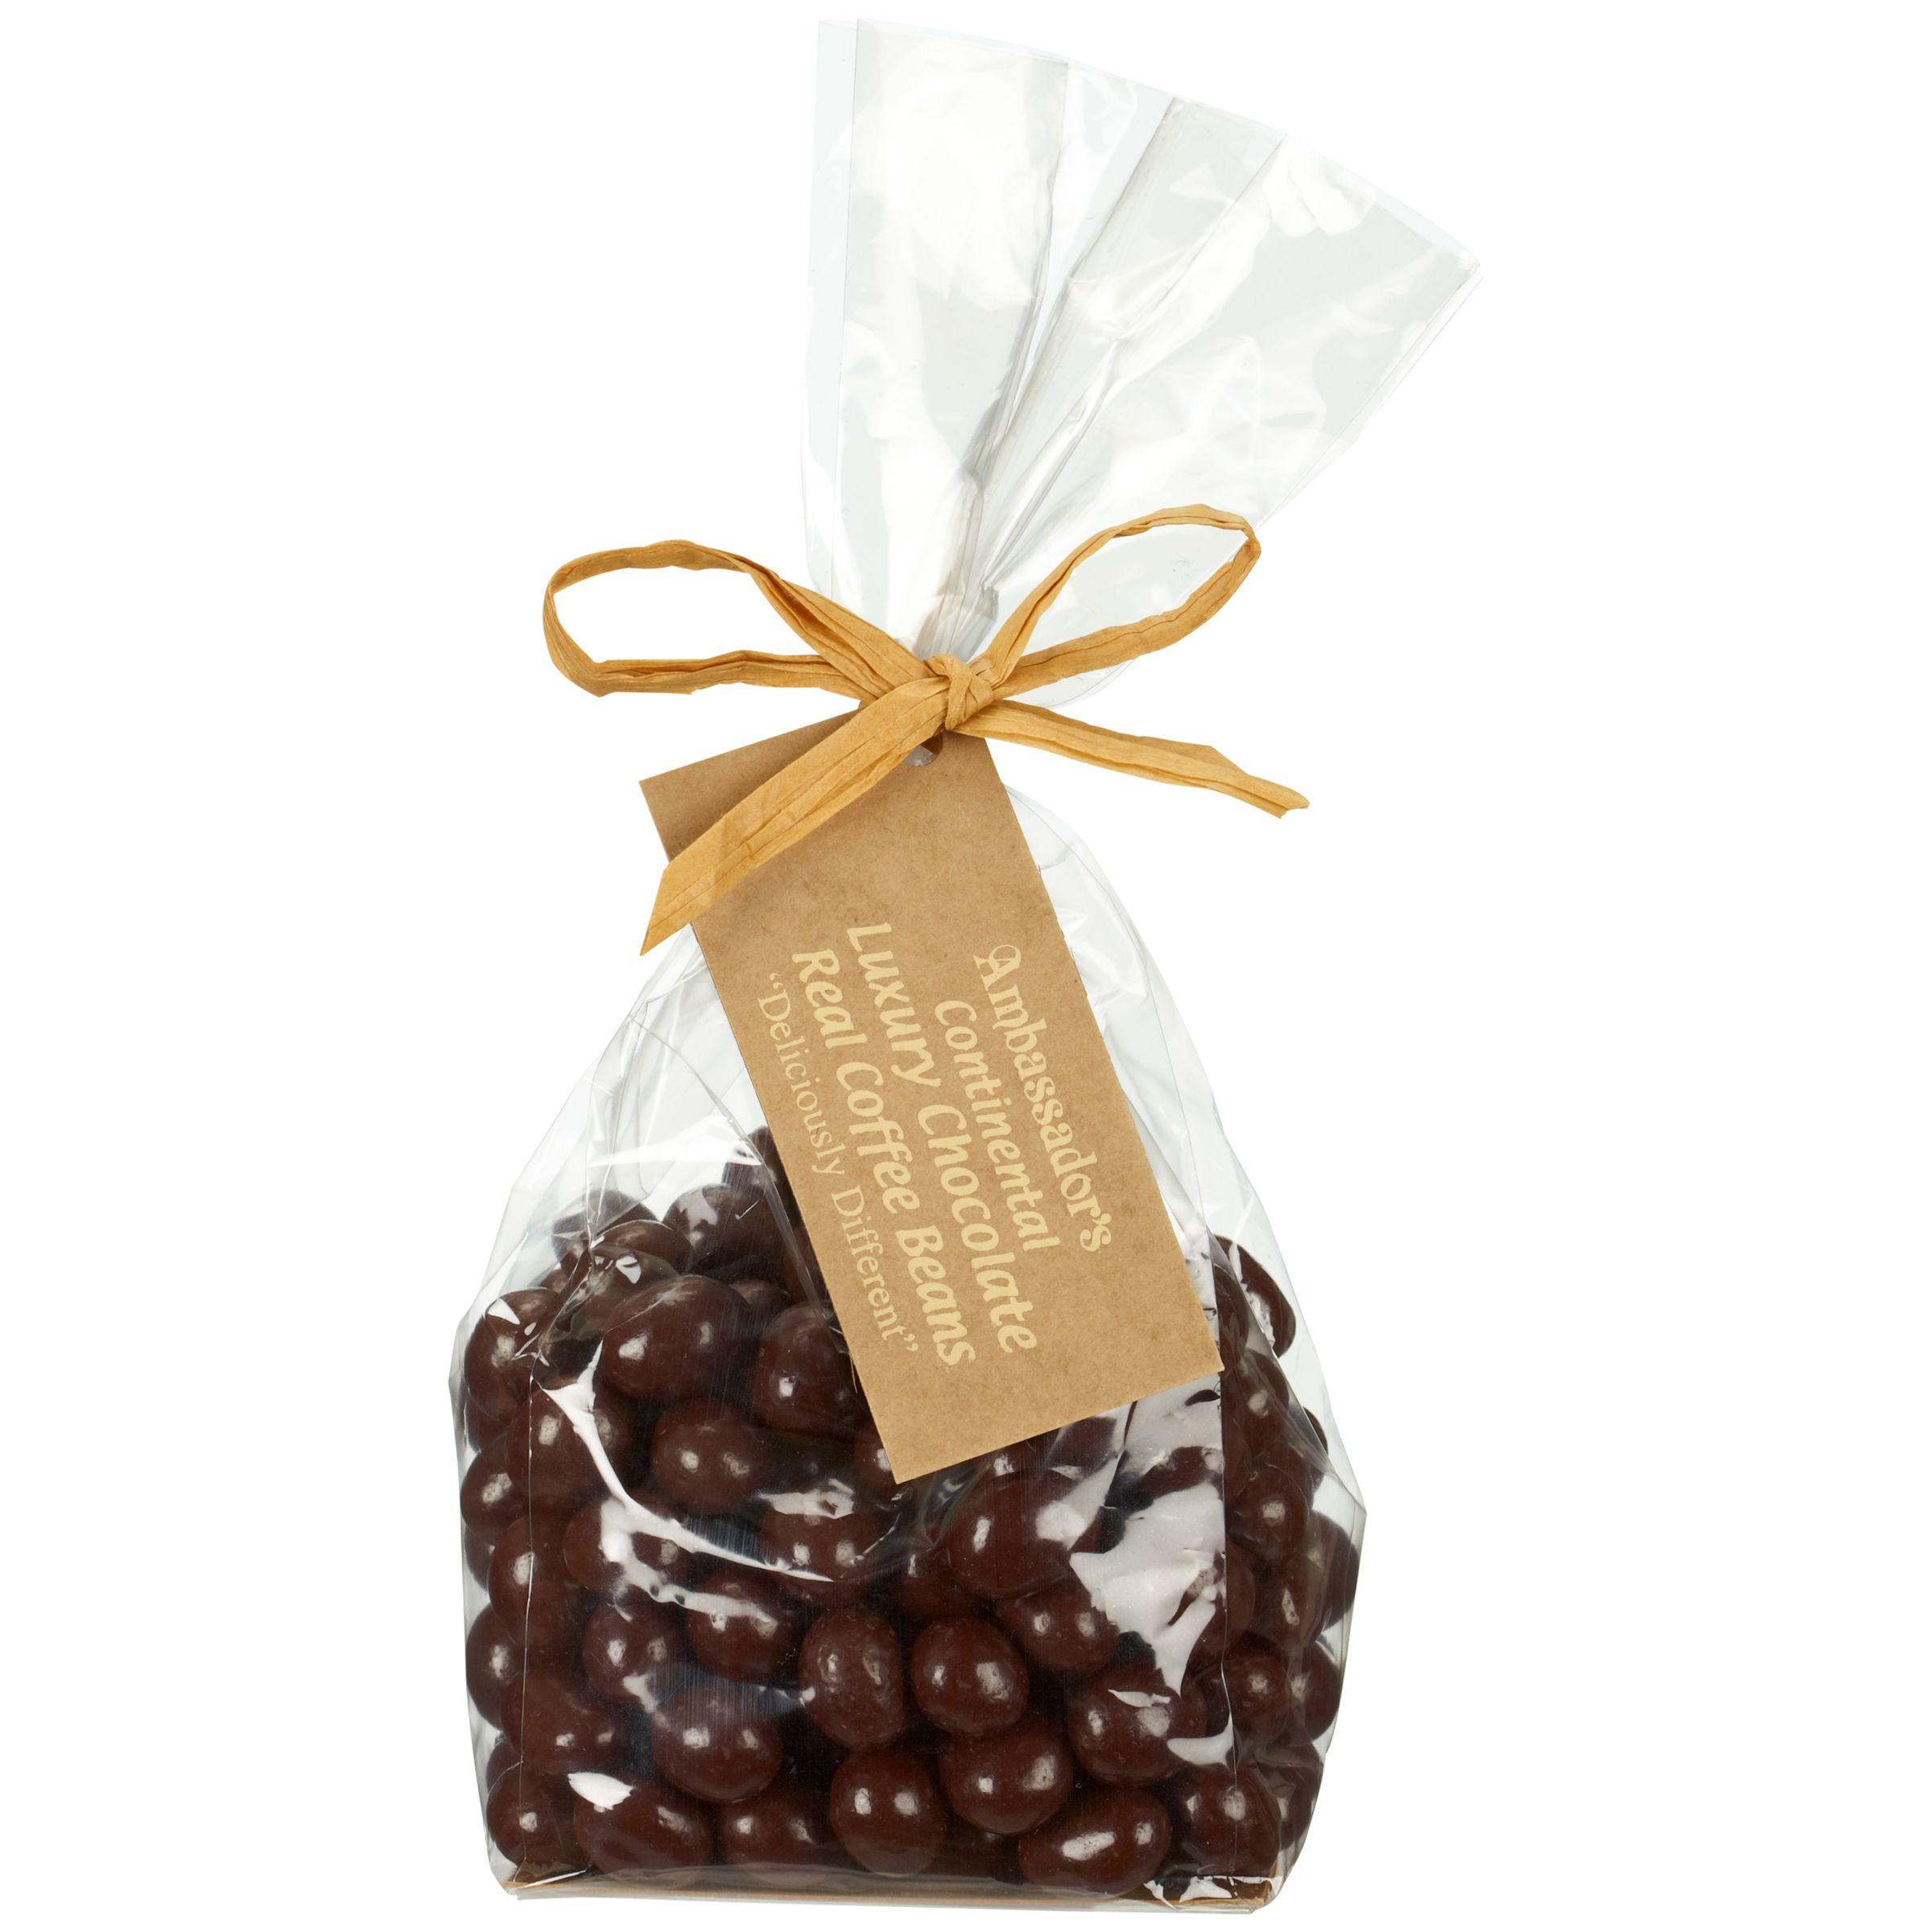 Ambassadors of London Ambassadors Of London Dark Chocolate Coffee Beans, 200g